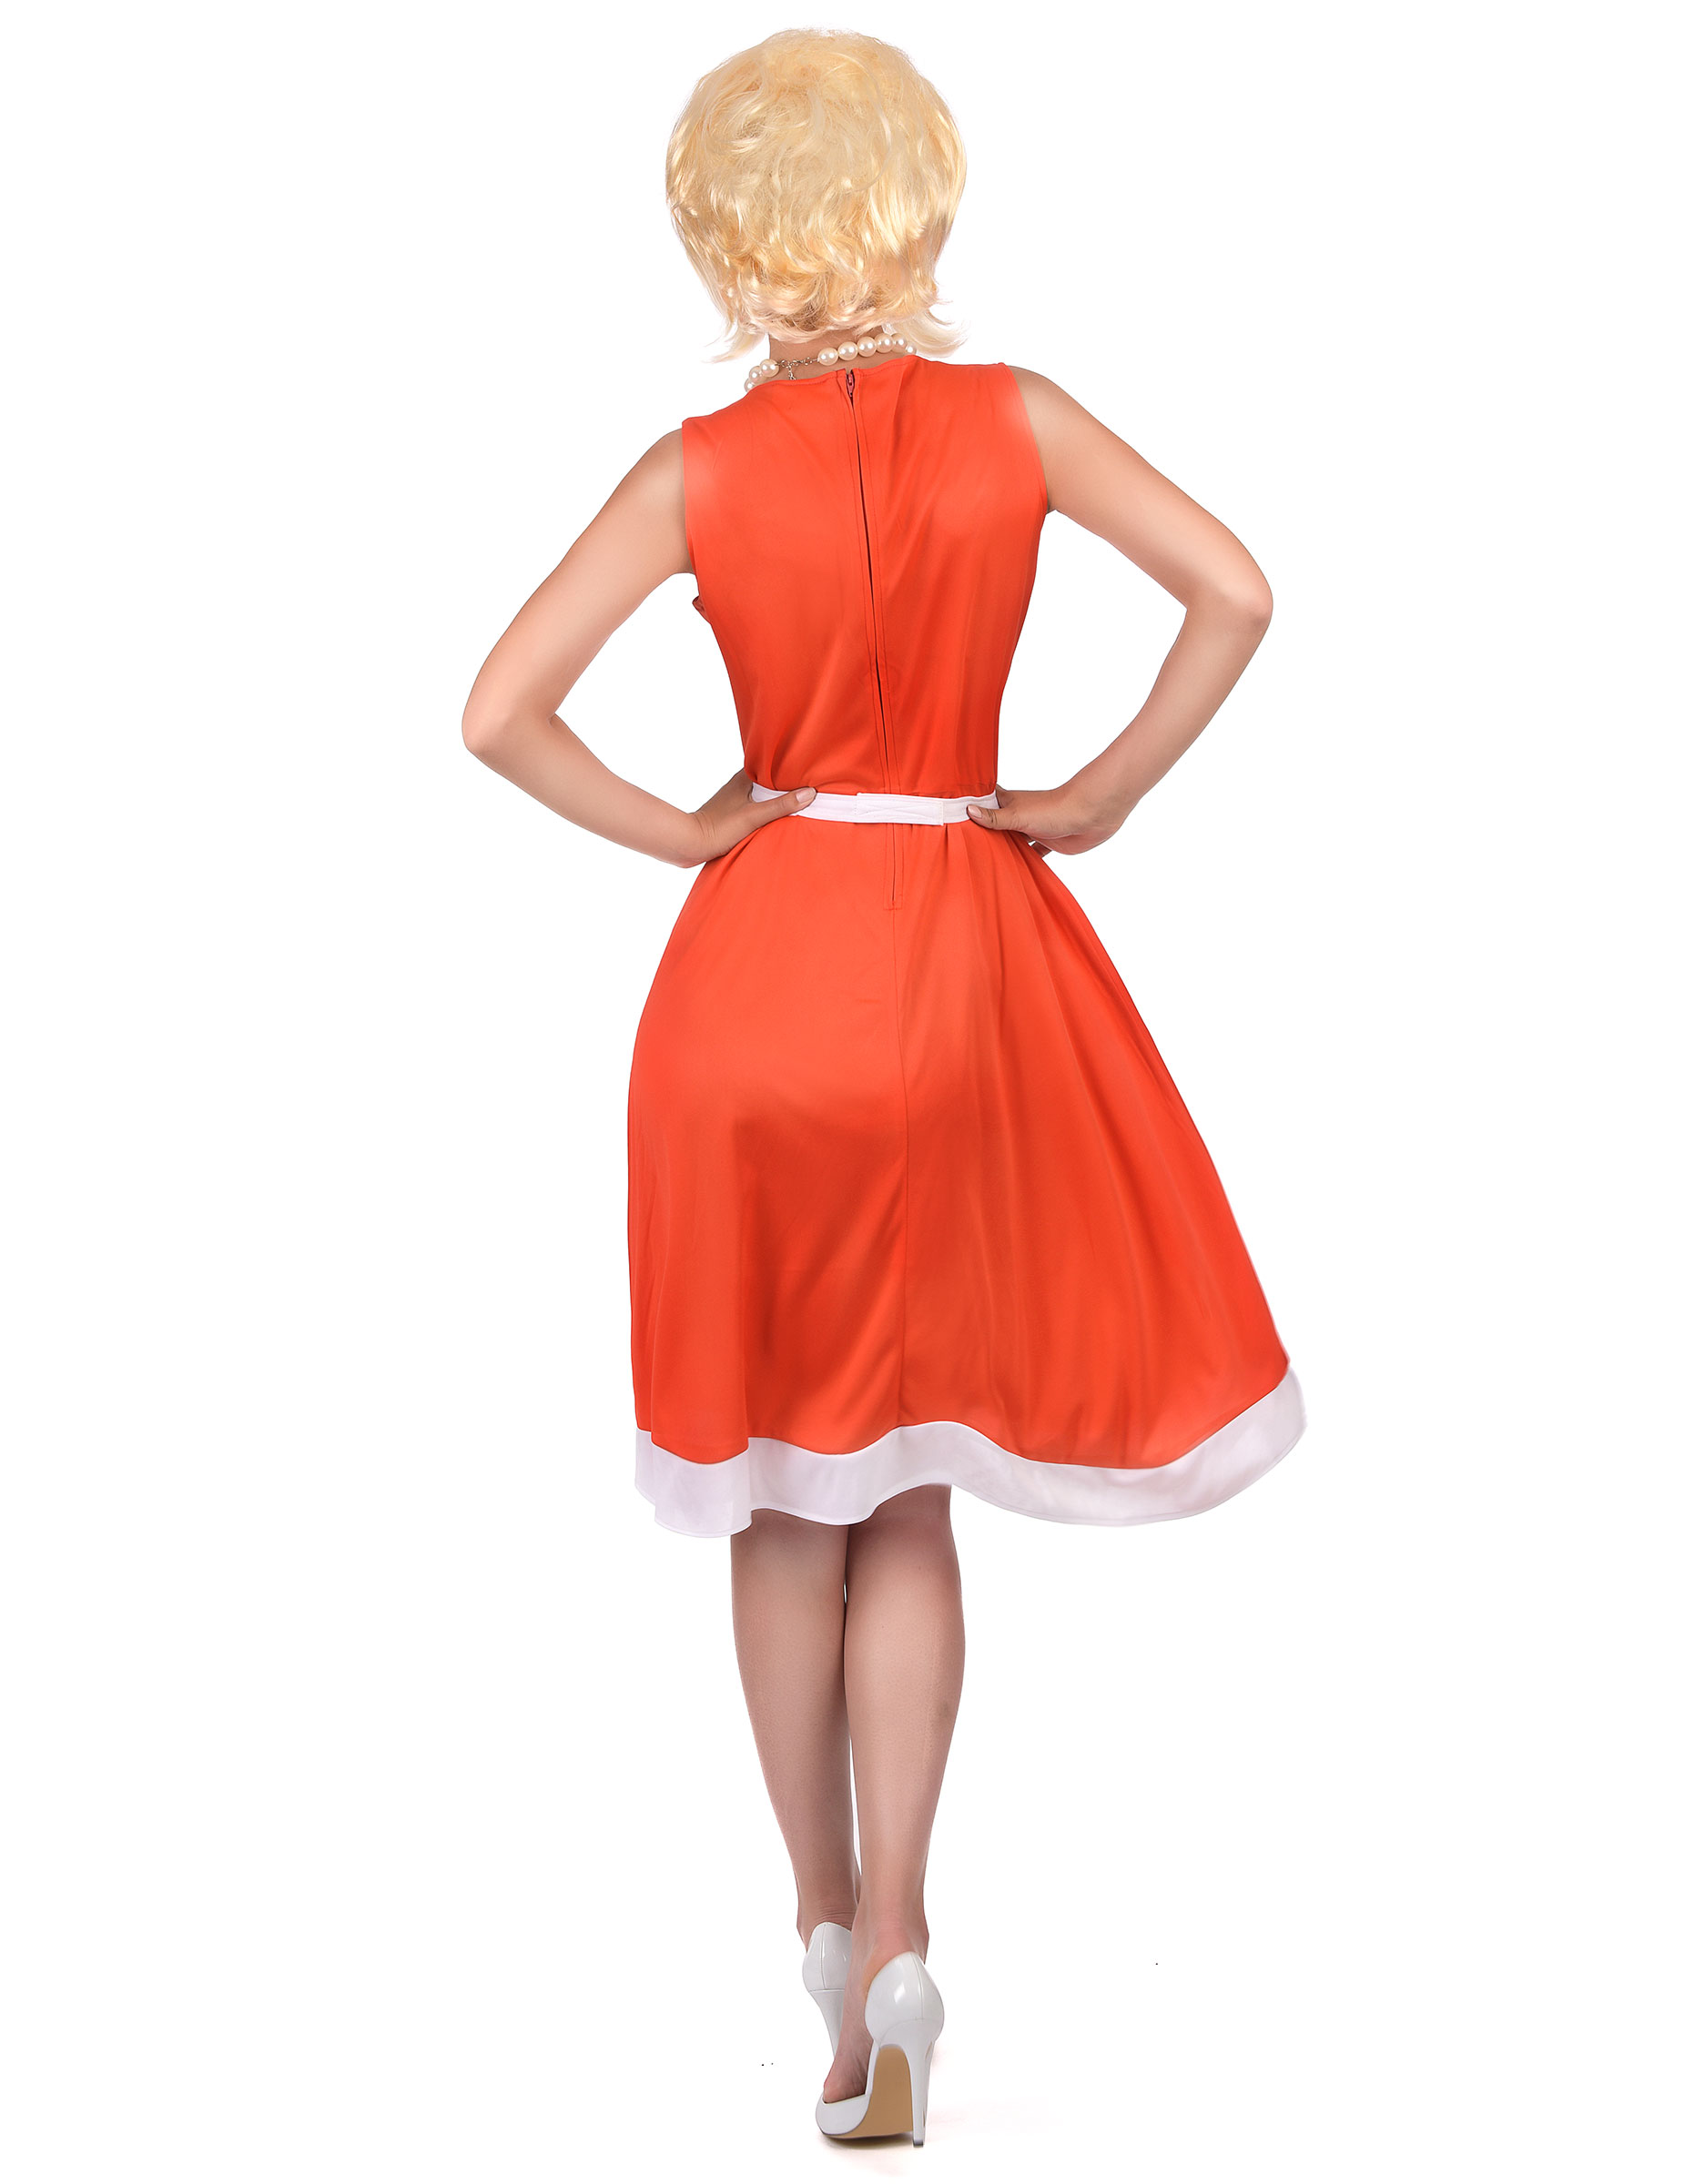 d8f9f1a2f31c Costume Vintage anni 50 60 da donna  Costumi adulti